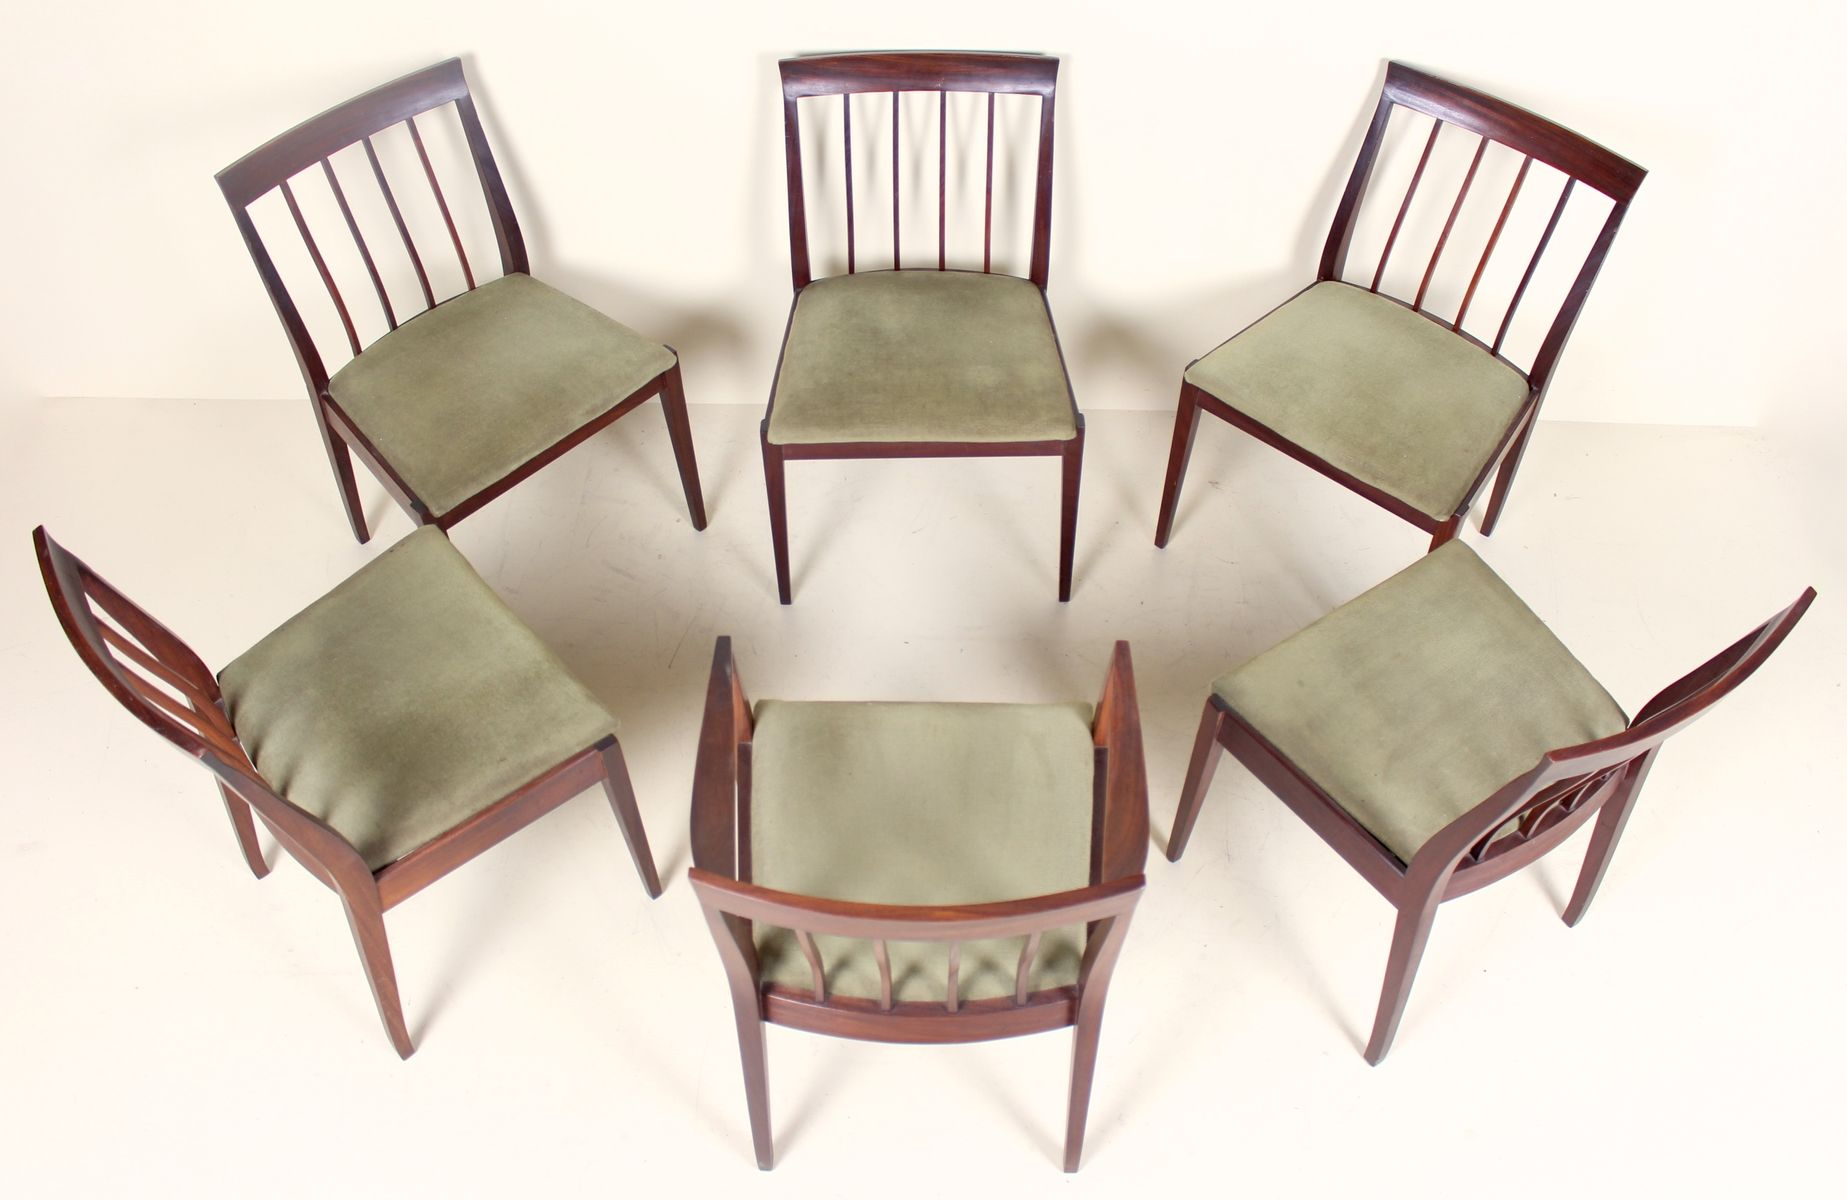 vintage esstisch 6 st hle 1970er bei pamono kaufen. Black Bedroom Furniture Sets. Home Design Ideas